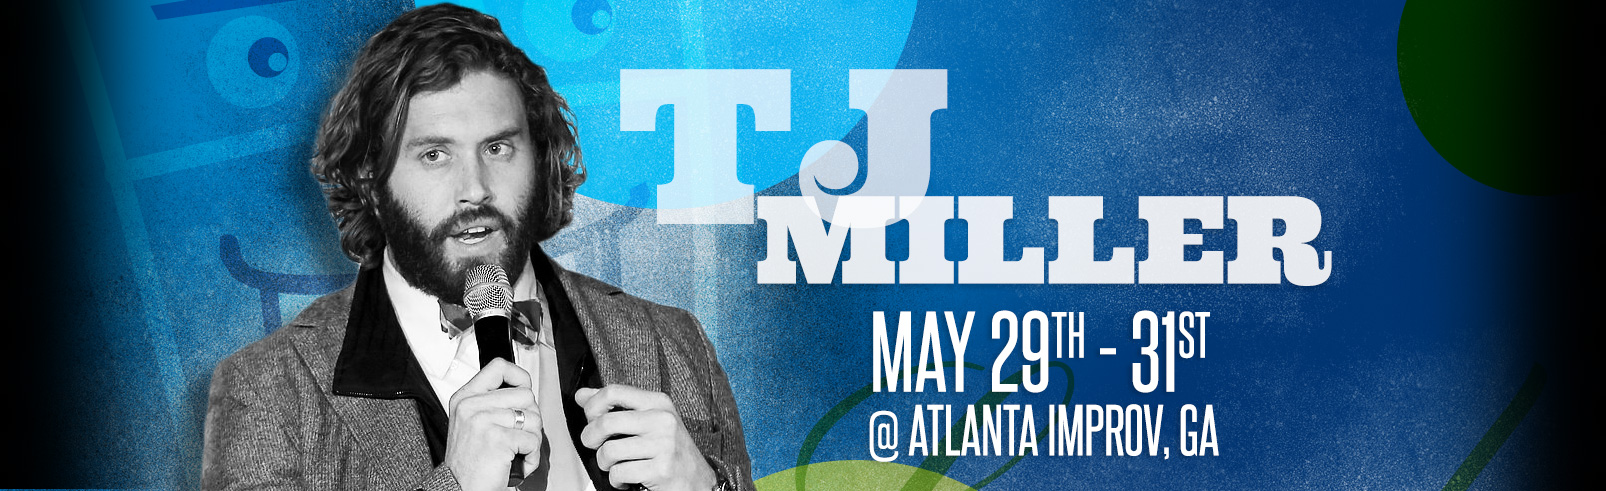 TJ Miller @ Atlanta Improv